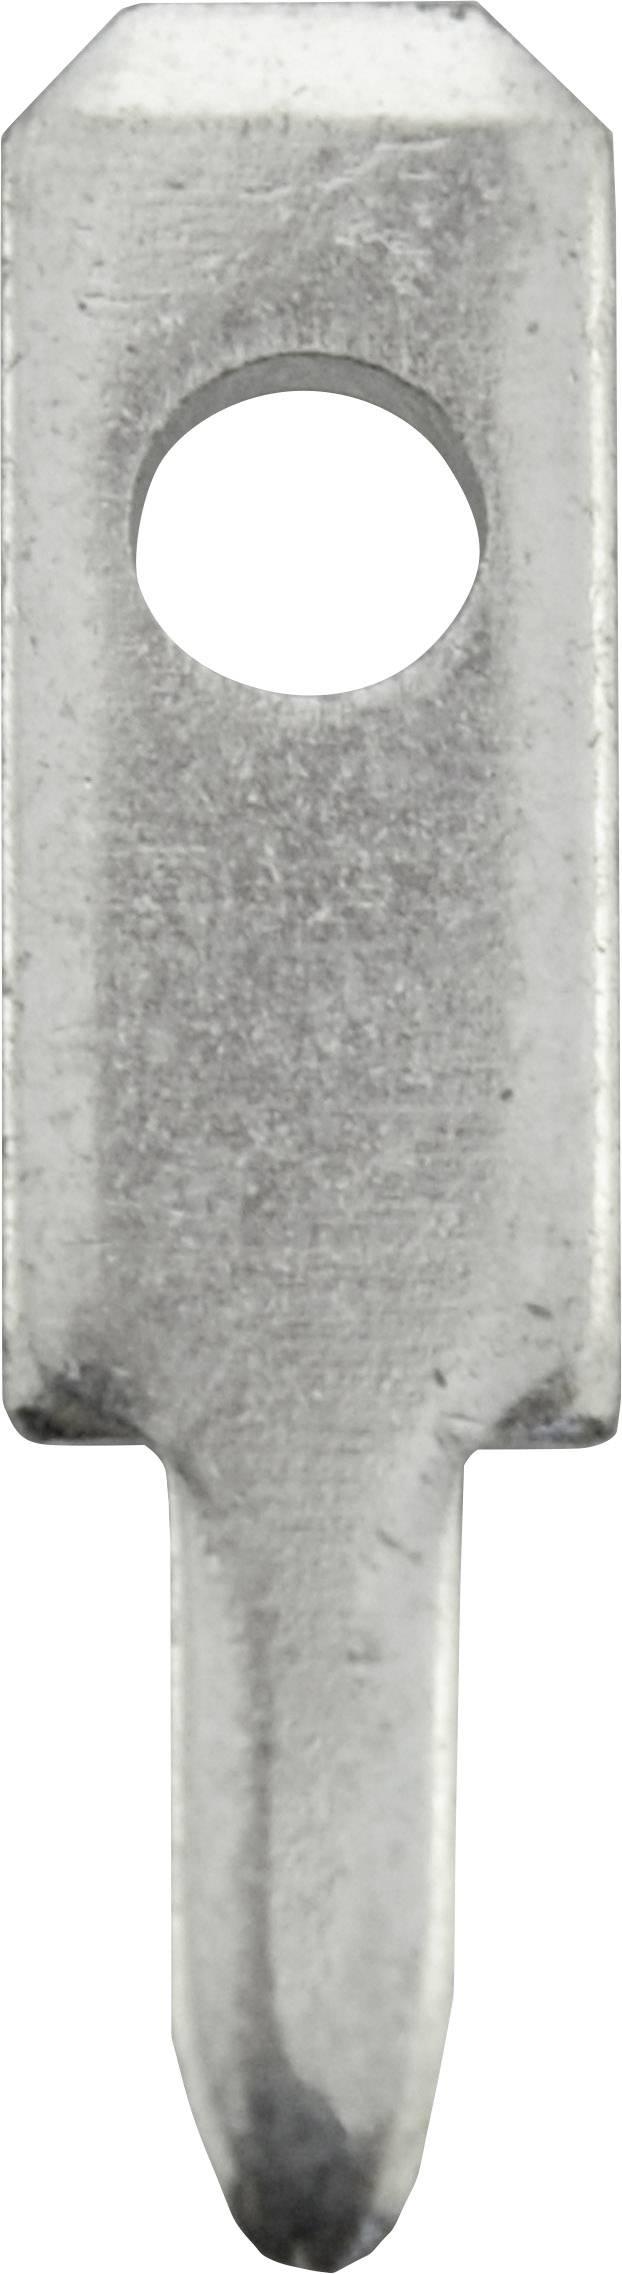 Faston zástrčka Vogt Verbindungstechnik 3780a05.68 2.8 mm x 0.5 mm, 180 °, bez izolace, kov, 100 ks